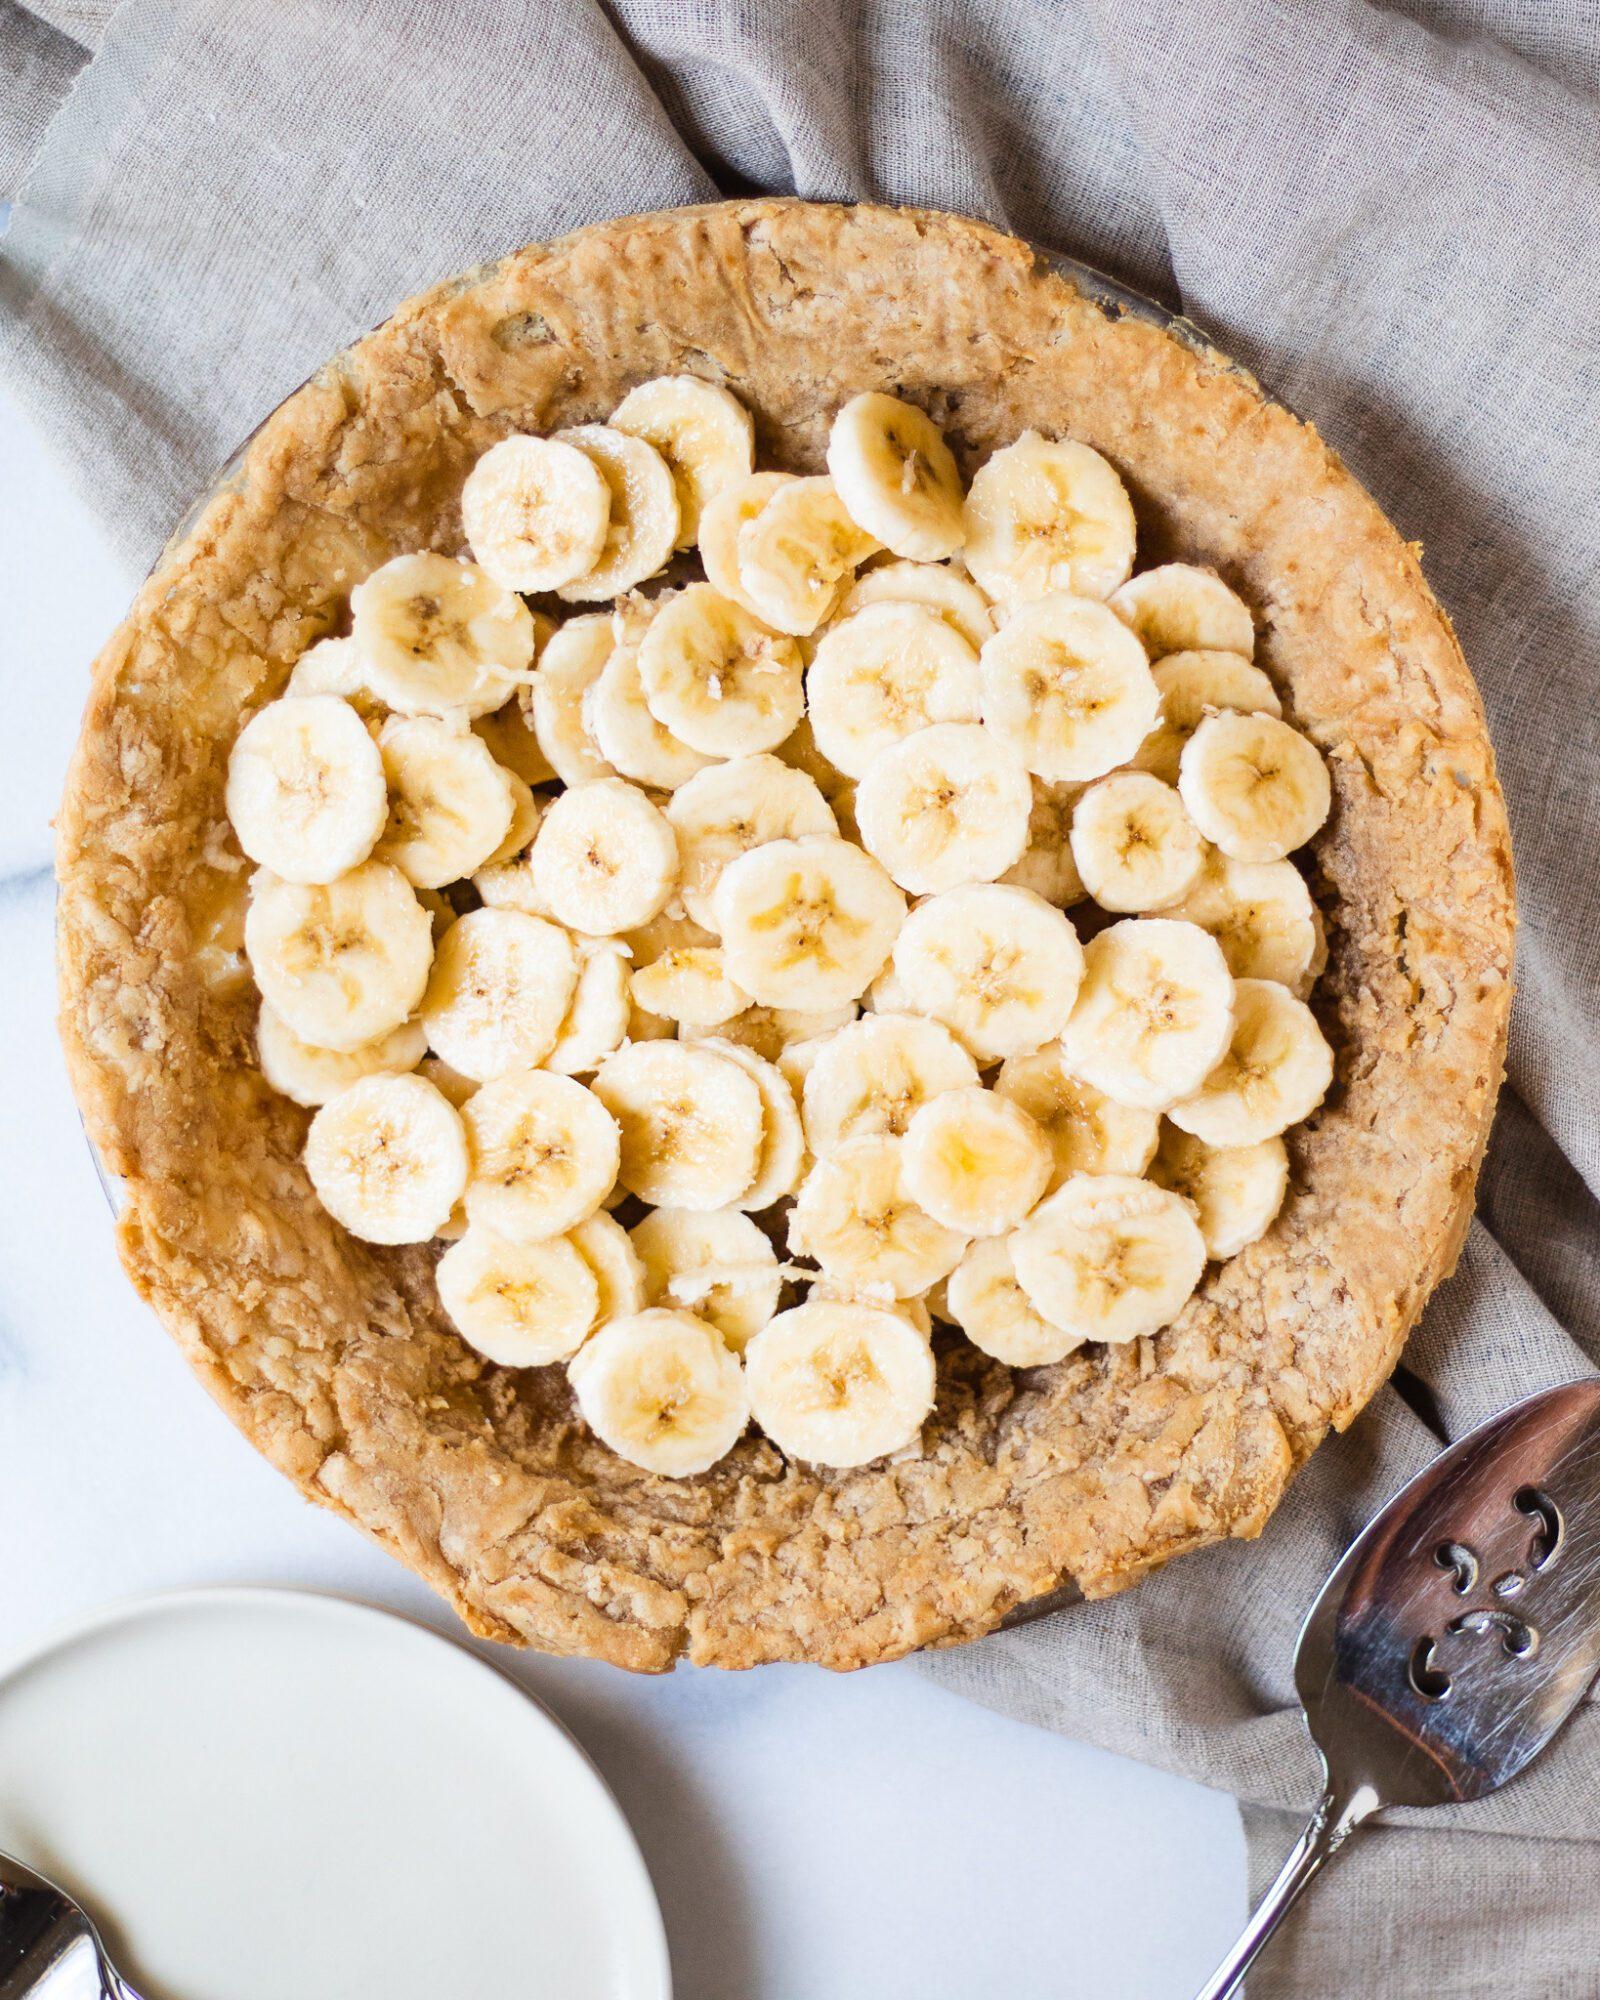 banana coins in pie crust